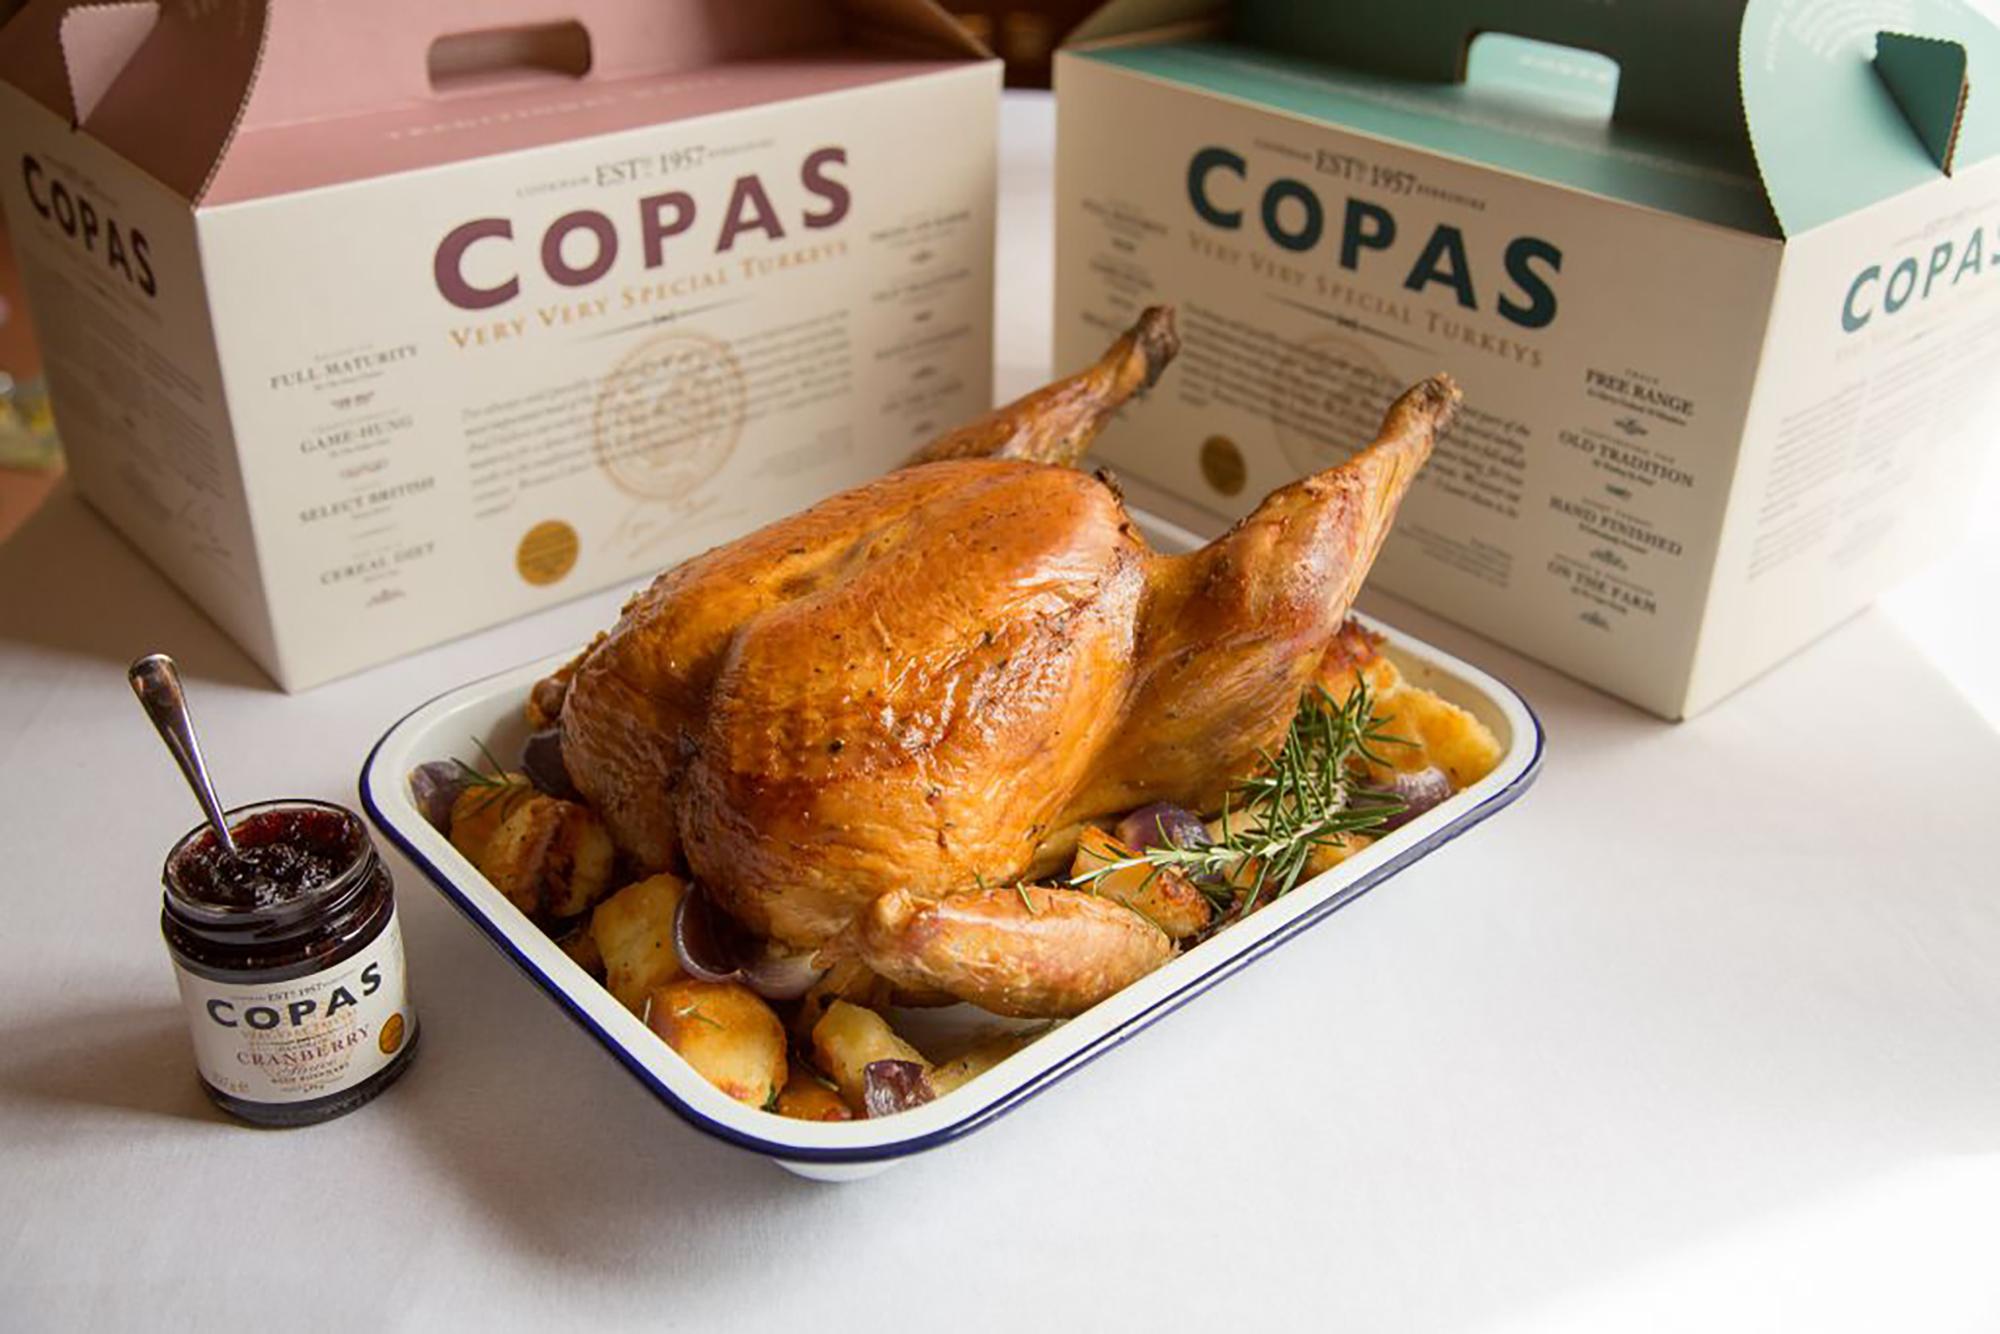 Copas Turkey & Boxes - Very Very Special Turkeys